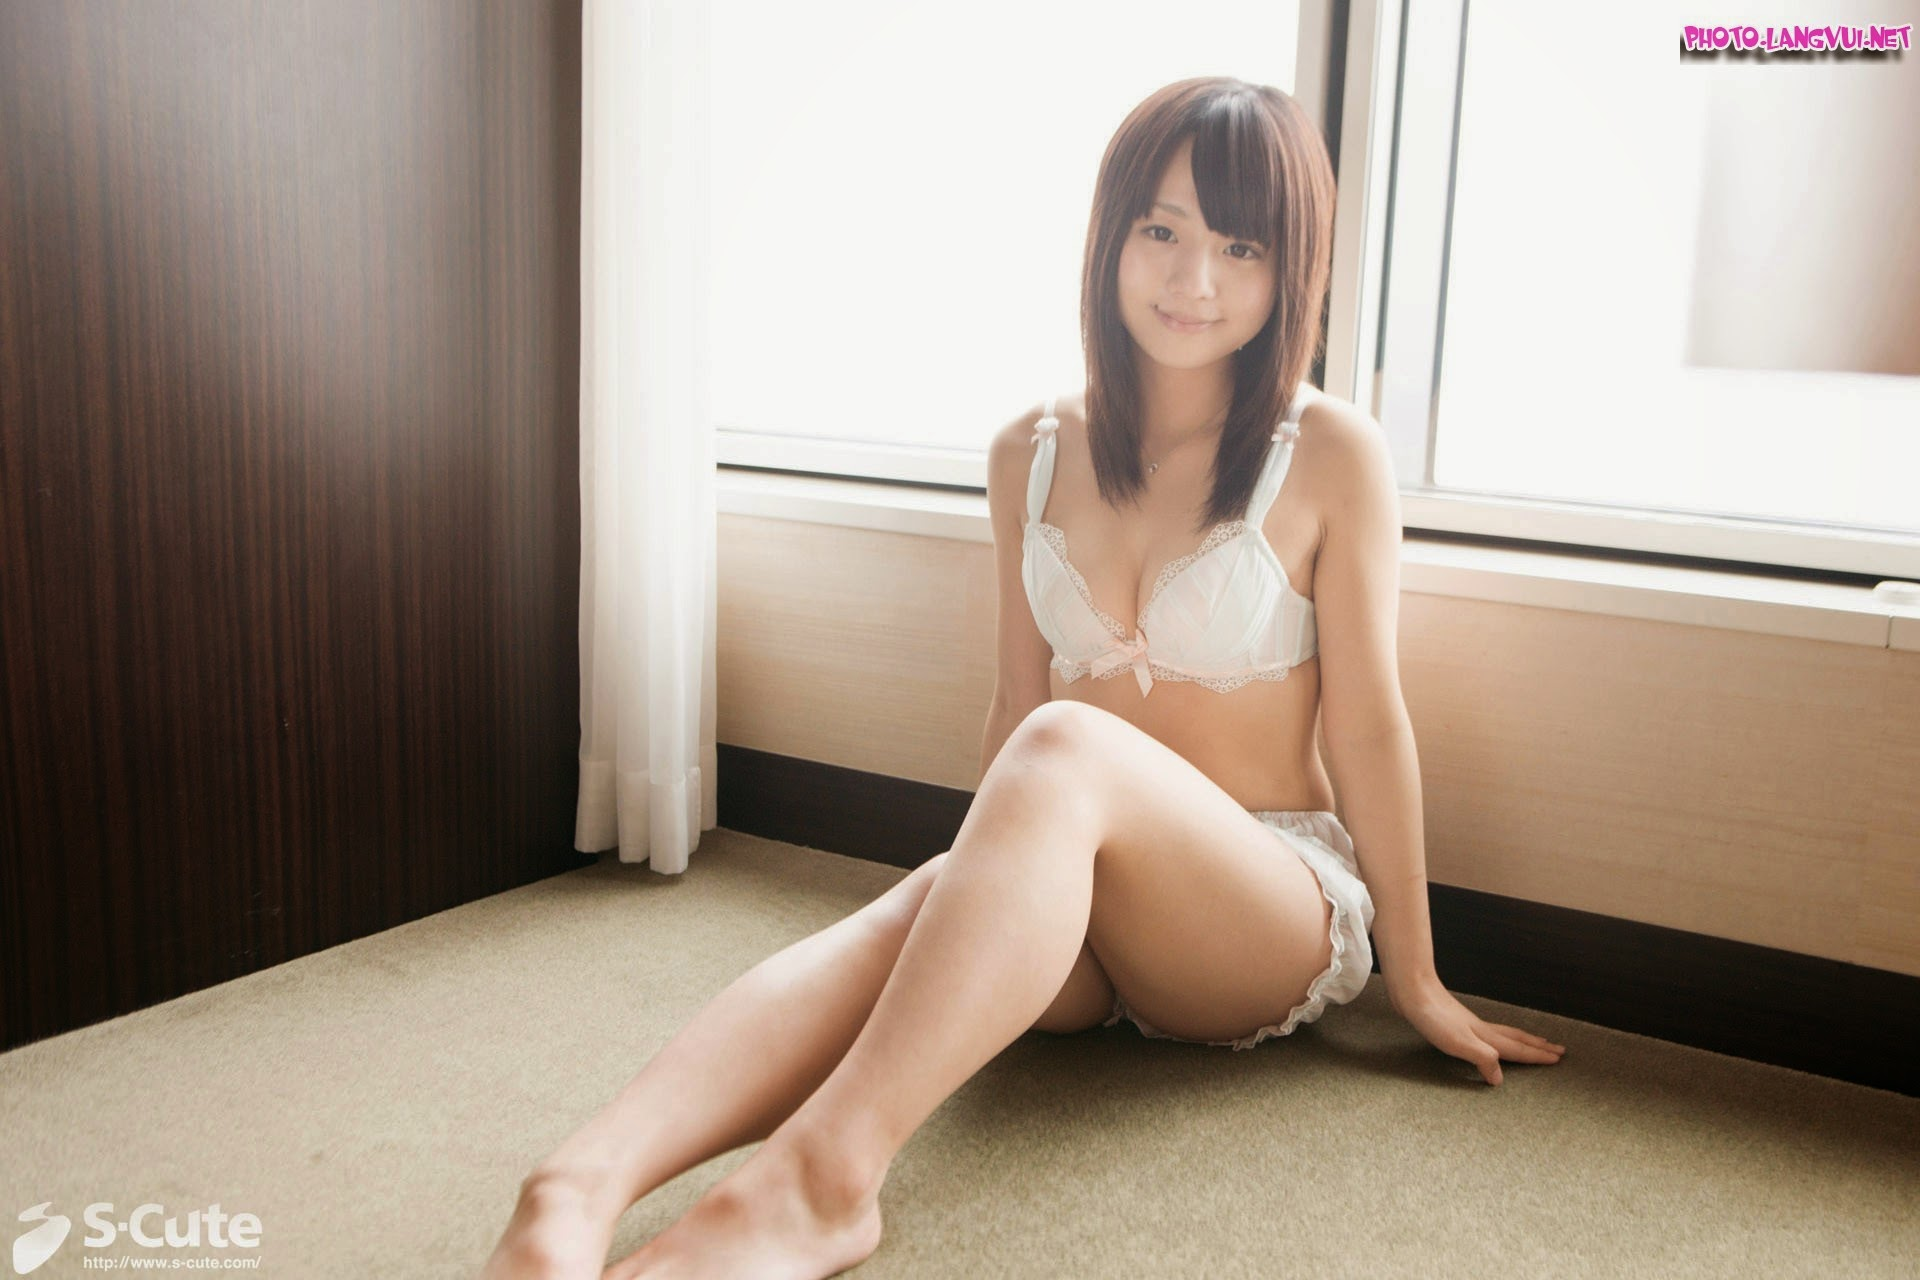 S-Cute No.304 Hitomi